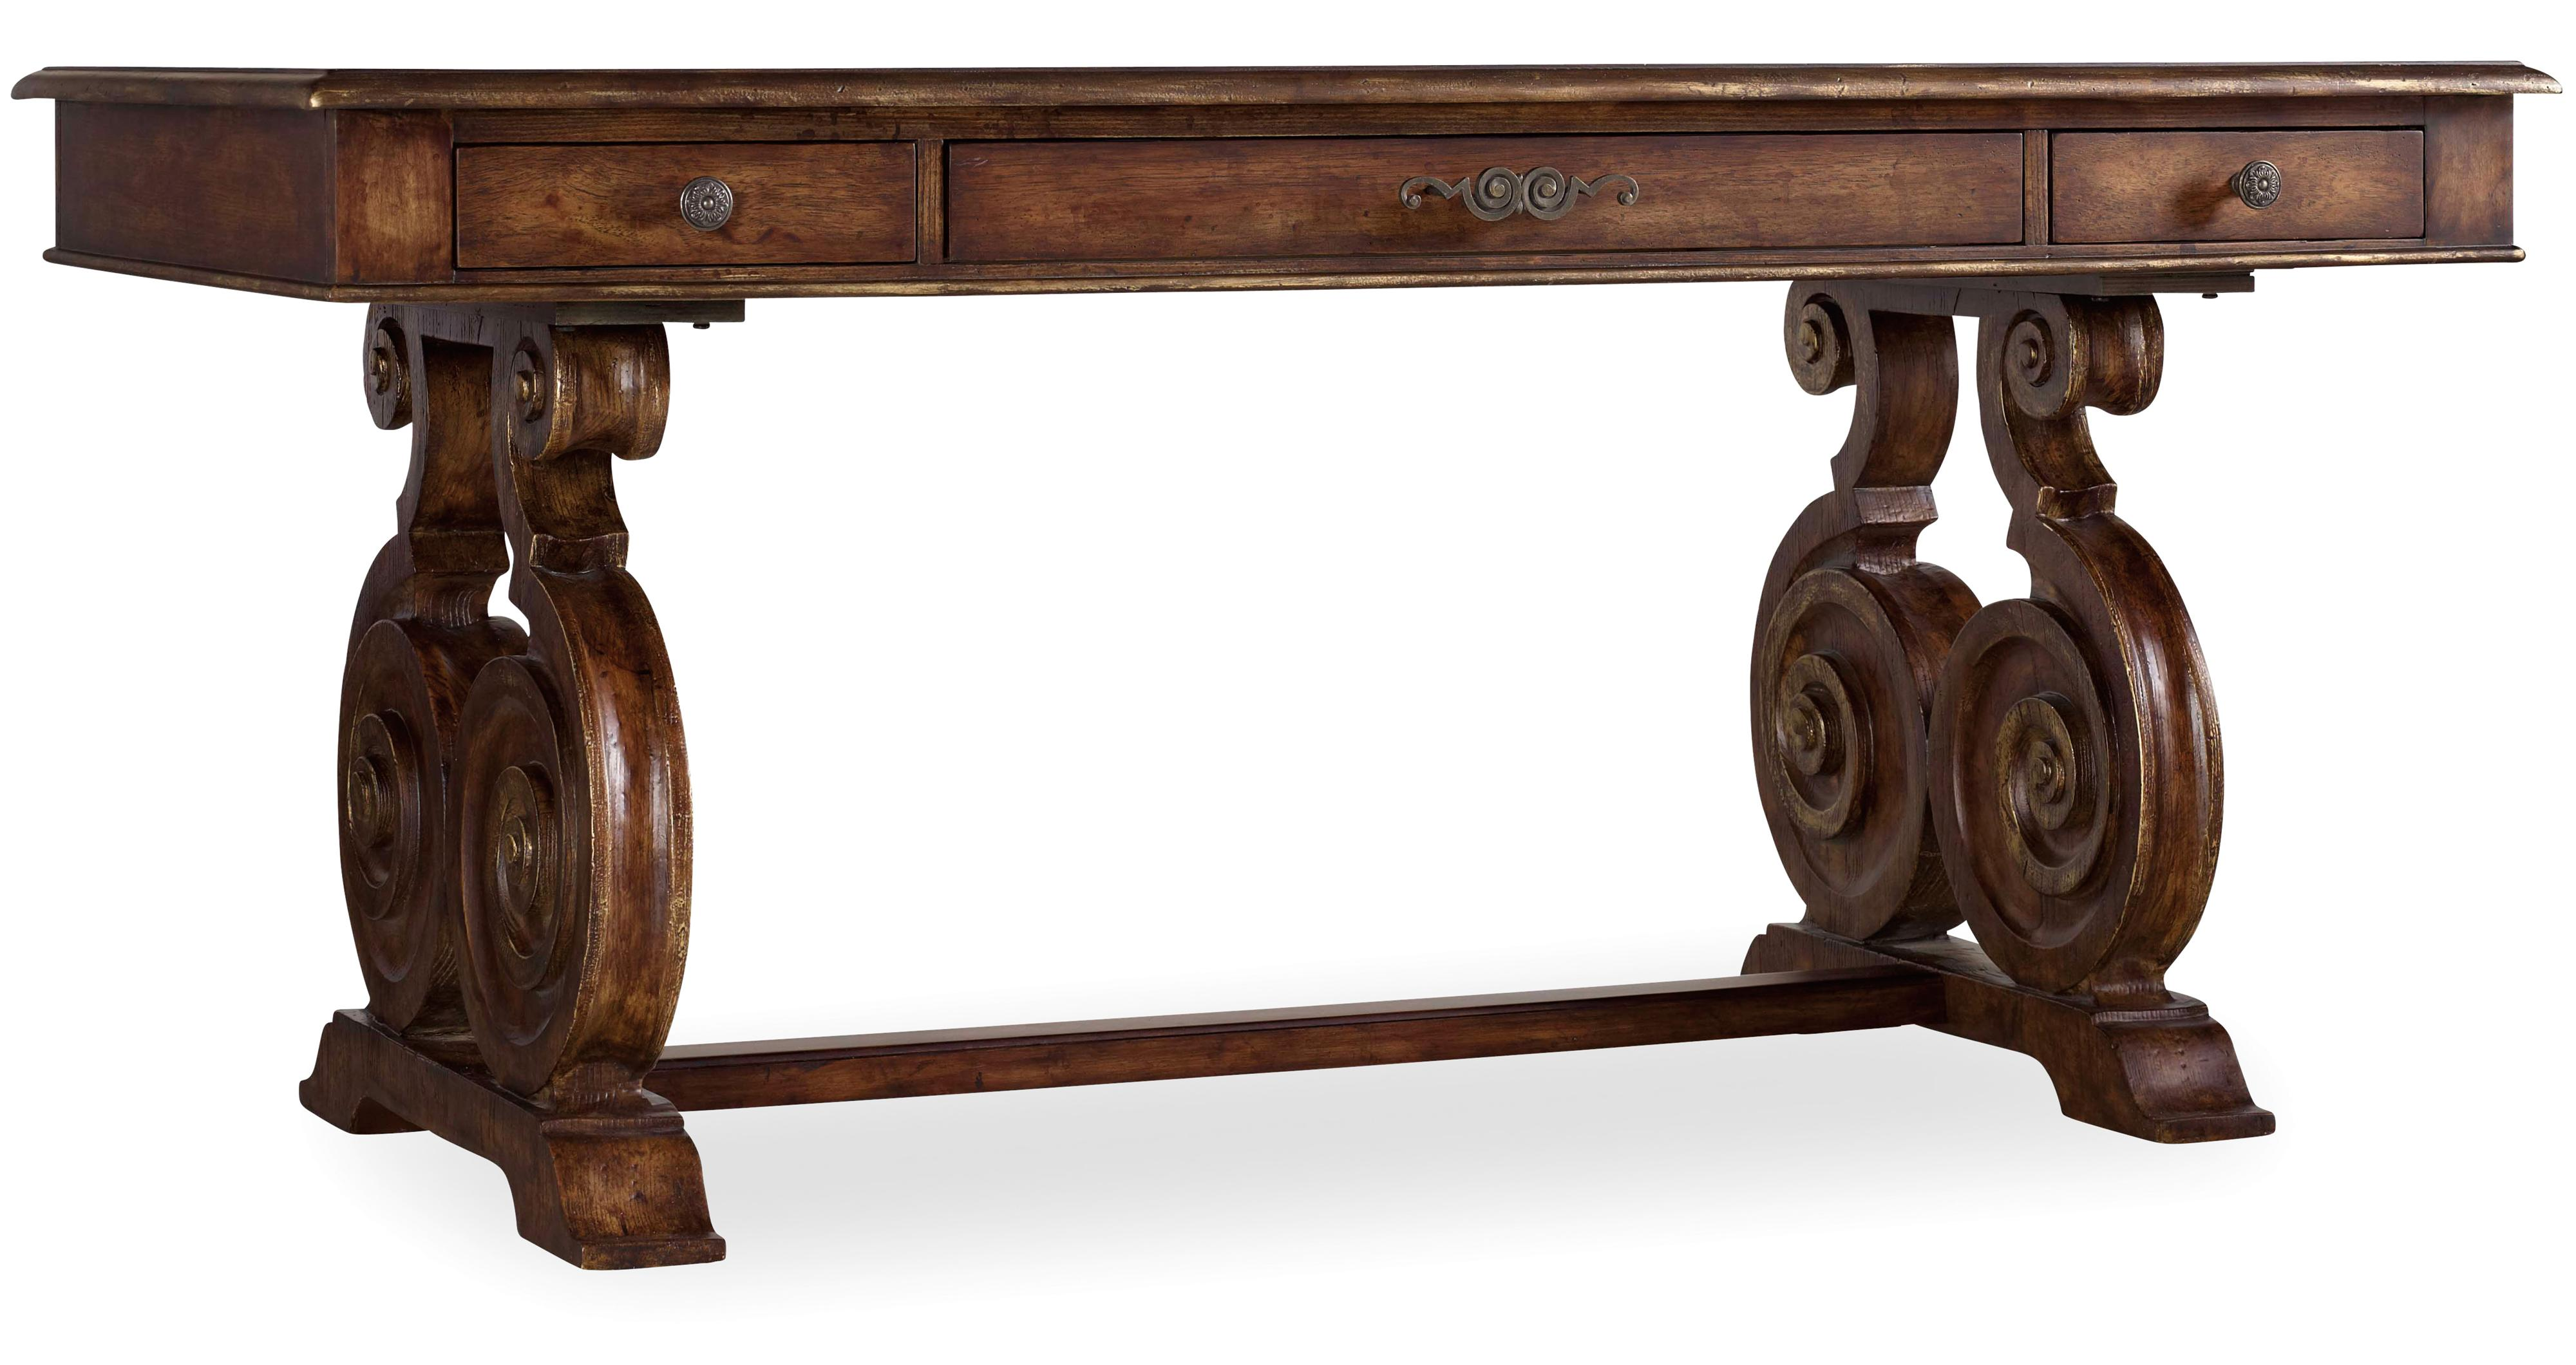 Hooker Furniture Adagio Writing Desk - Item Number: 5091-10459